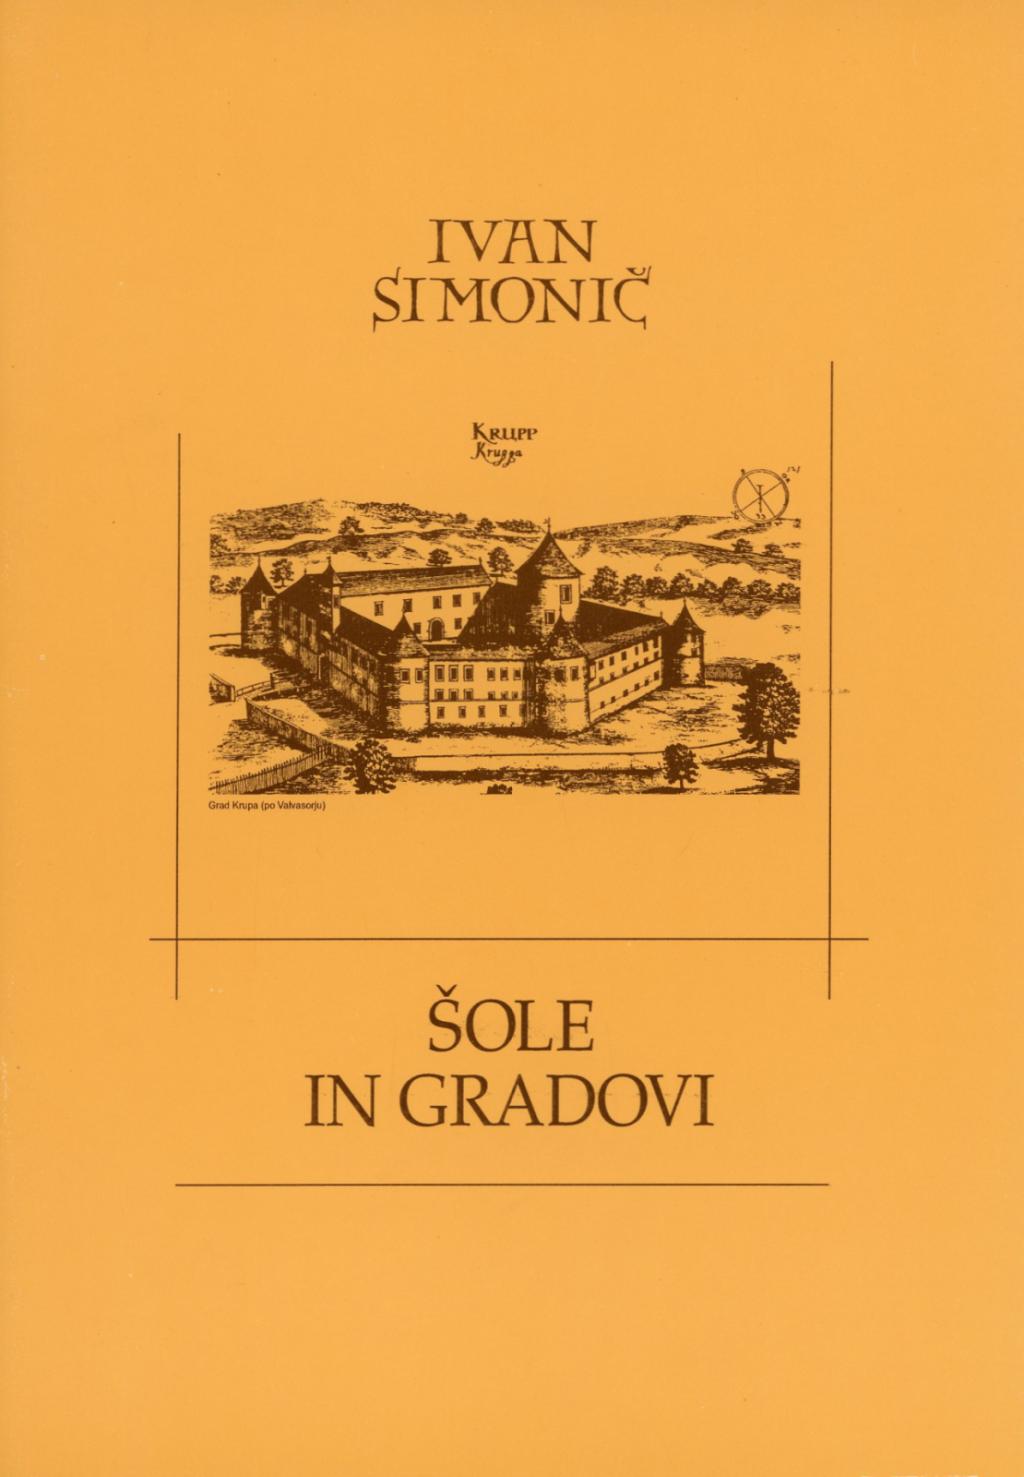 Ivan Simonič <br> Šole in gradovi, 1997